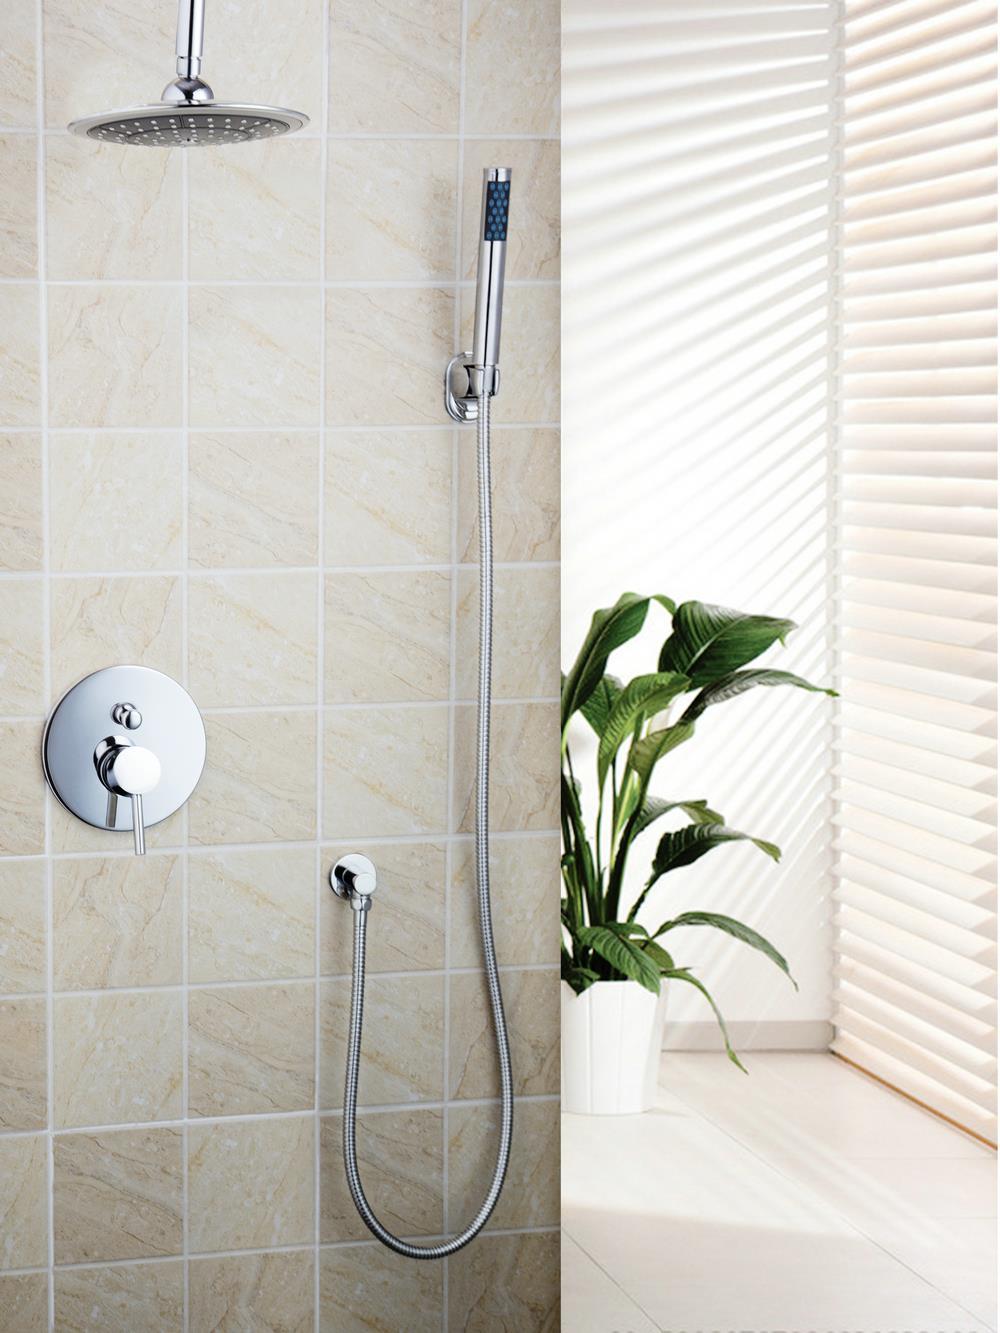 Hose for bathroom faucet - Bathroom Chrome 8 Abs Shower Head Brass Valve Hand Spray Hook